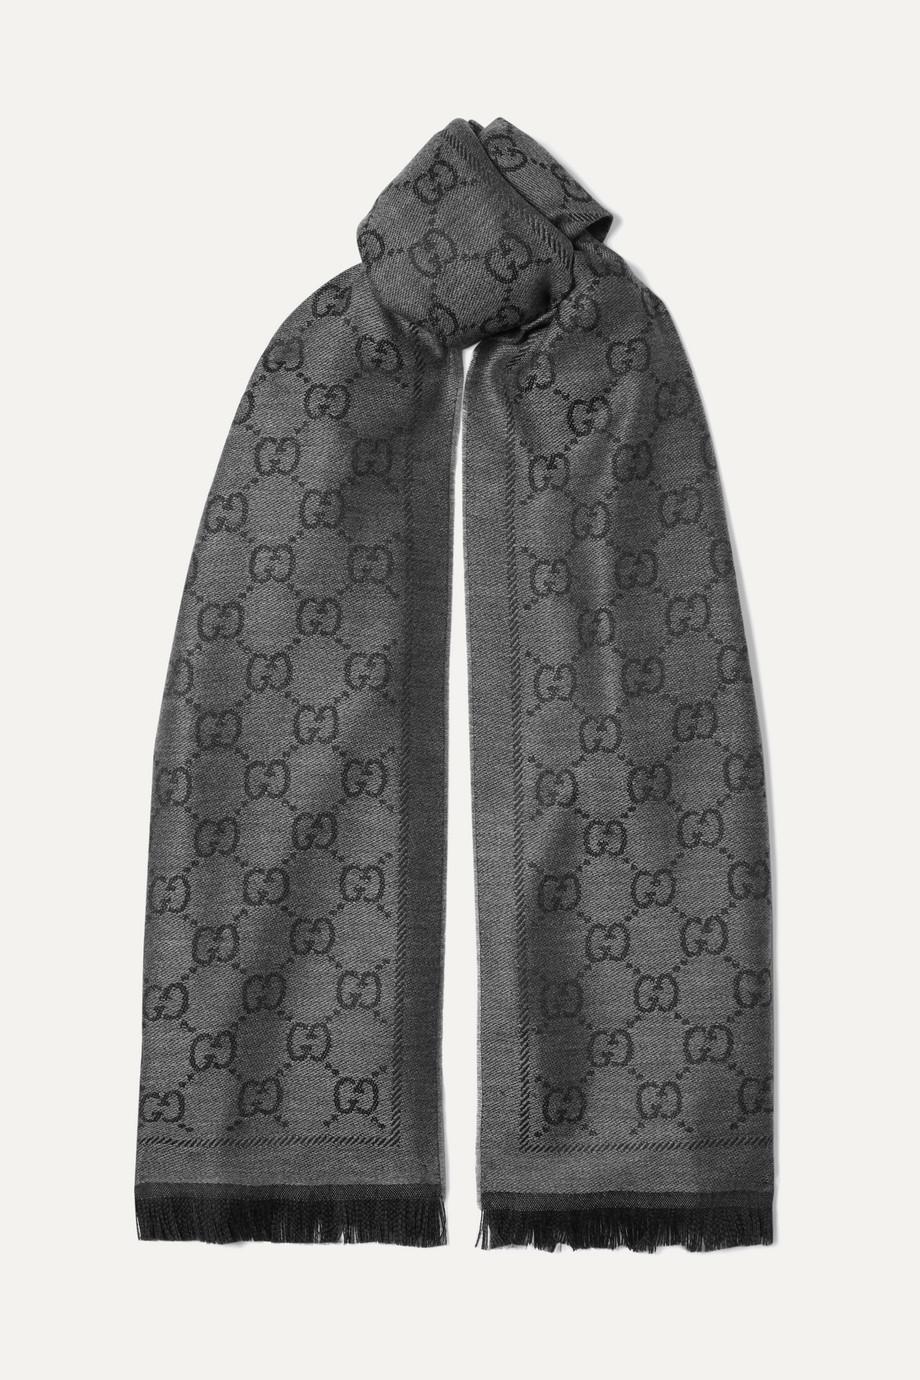 Gucci + NET SUSTAIN fringed organic wool-jacquard scarf